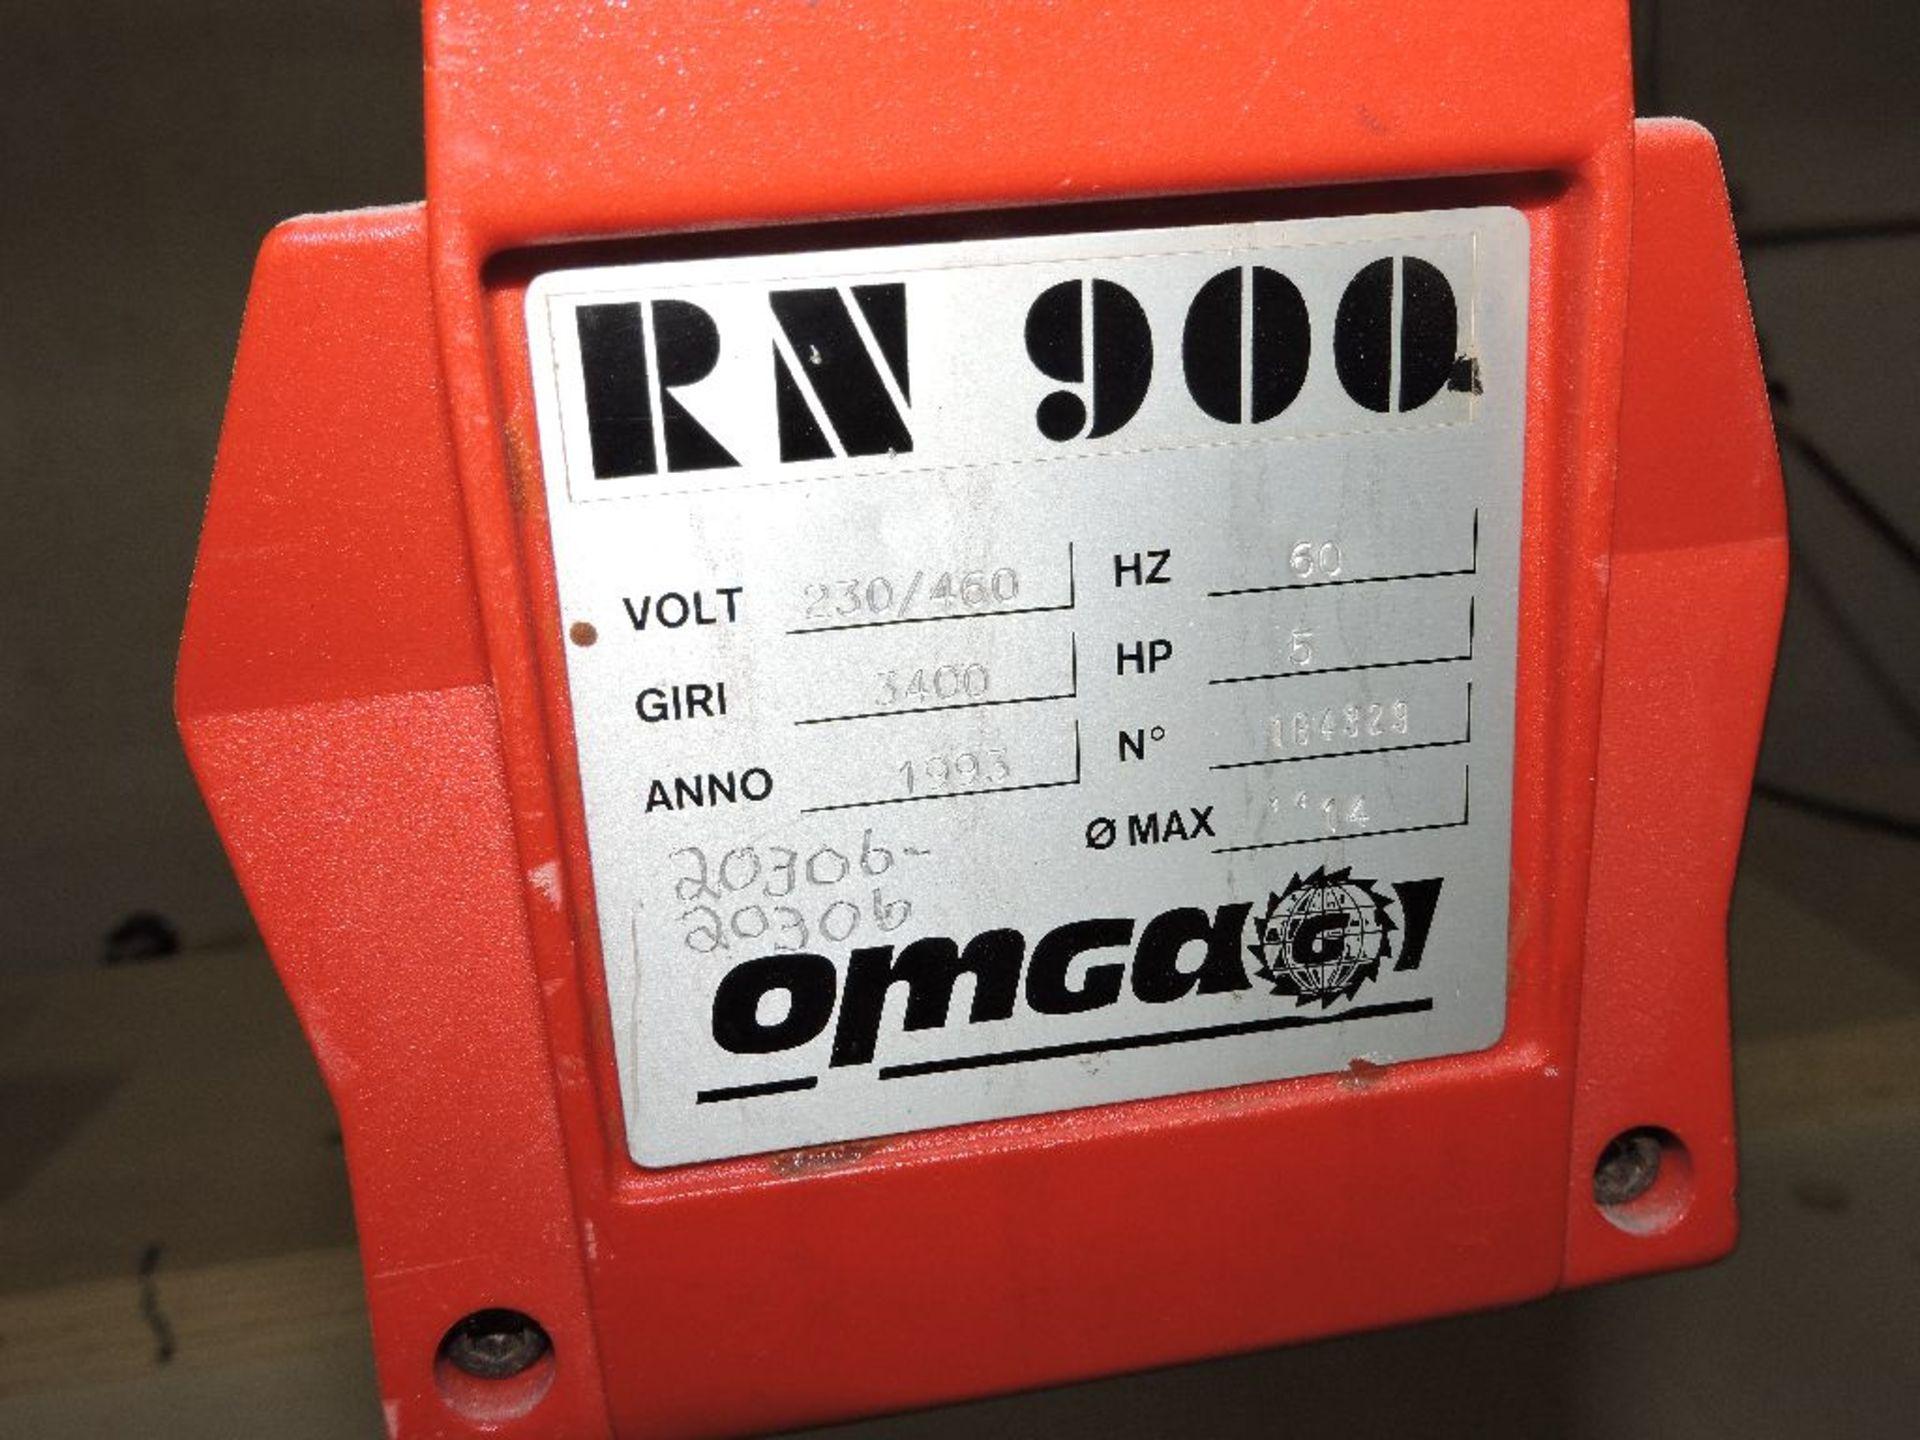 "Lot 018 - OMGAGA radial arm saw, model RN900, sn 20306, 5 hp., w/47"" x 179"" lay off table, voltage 230/460."